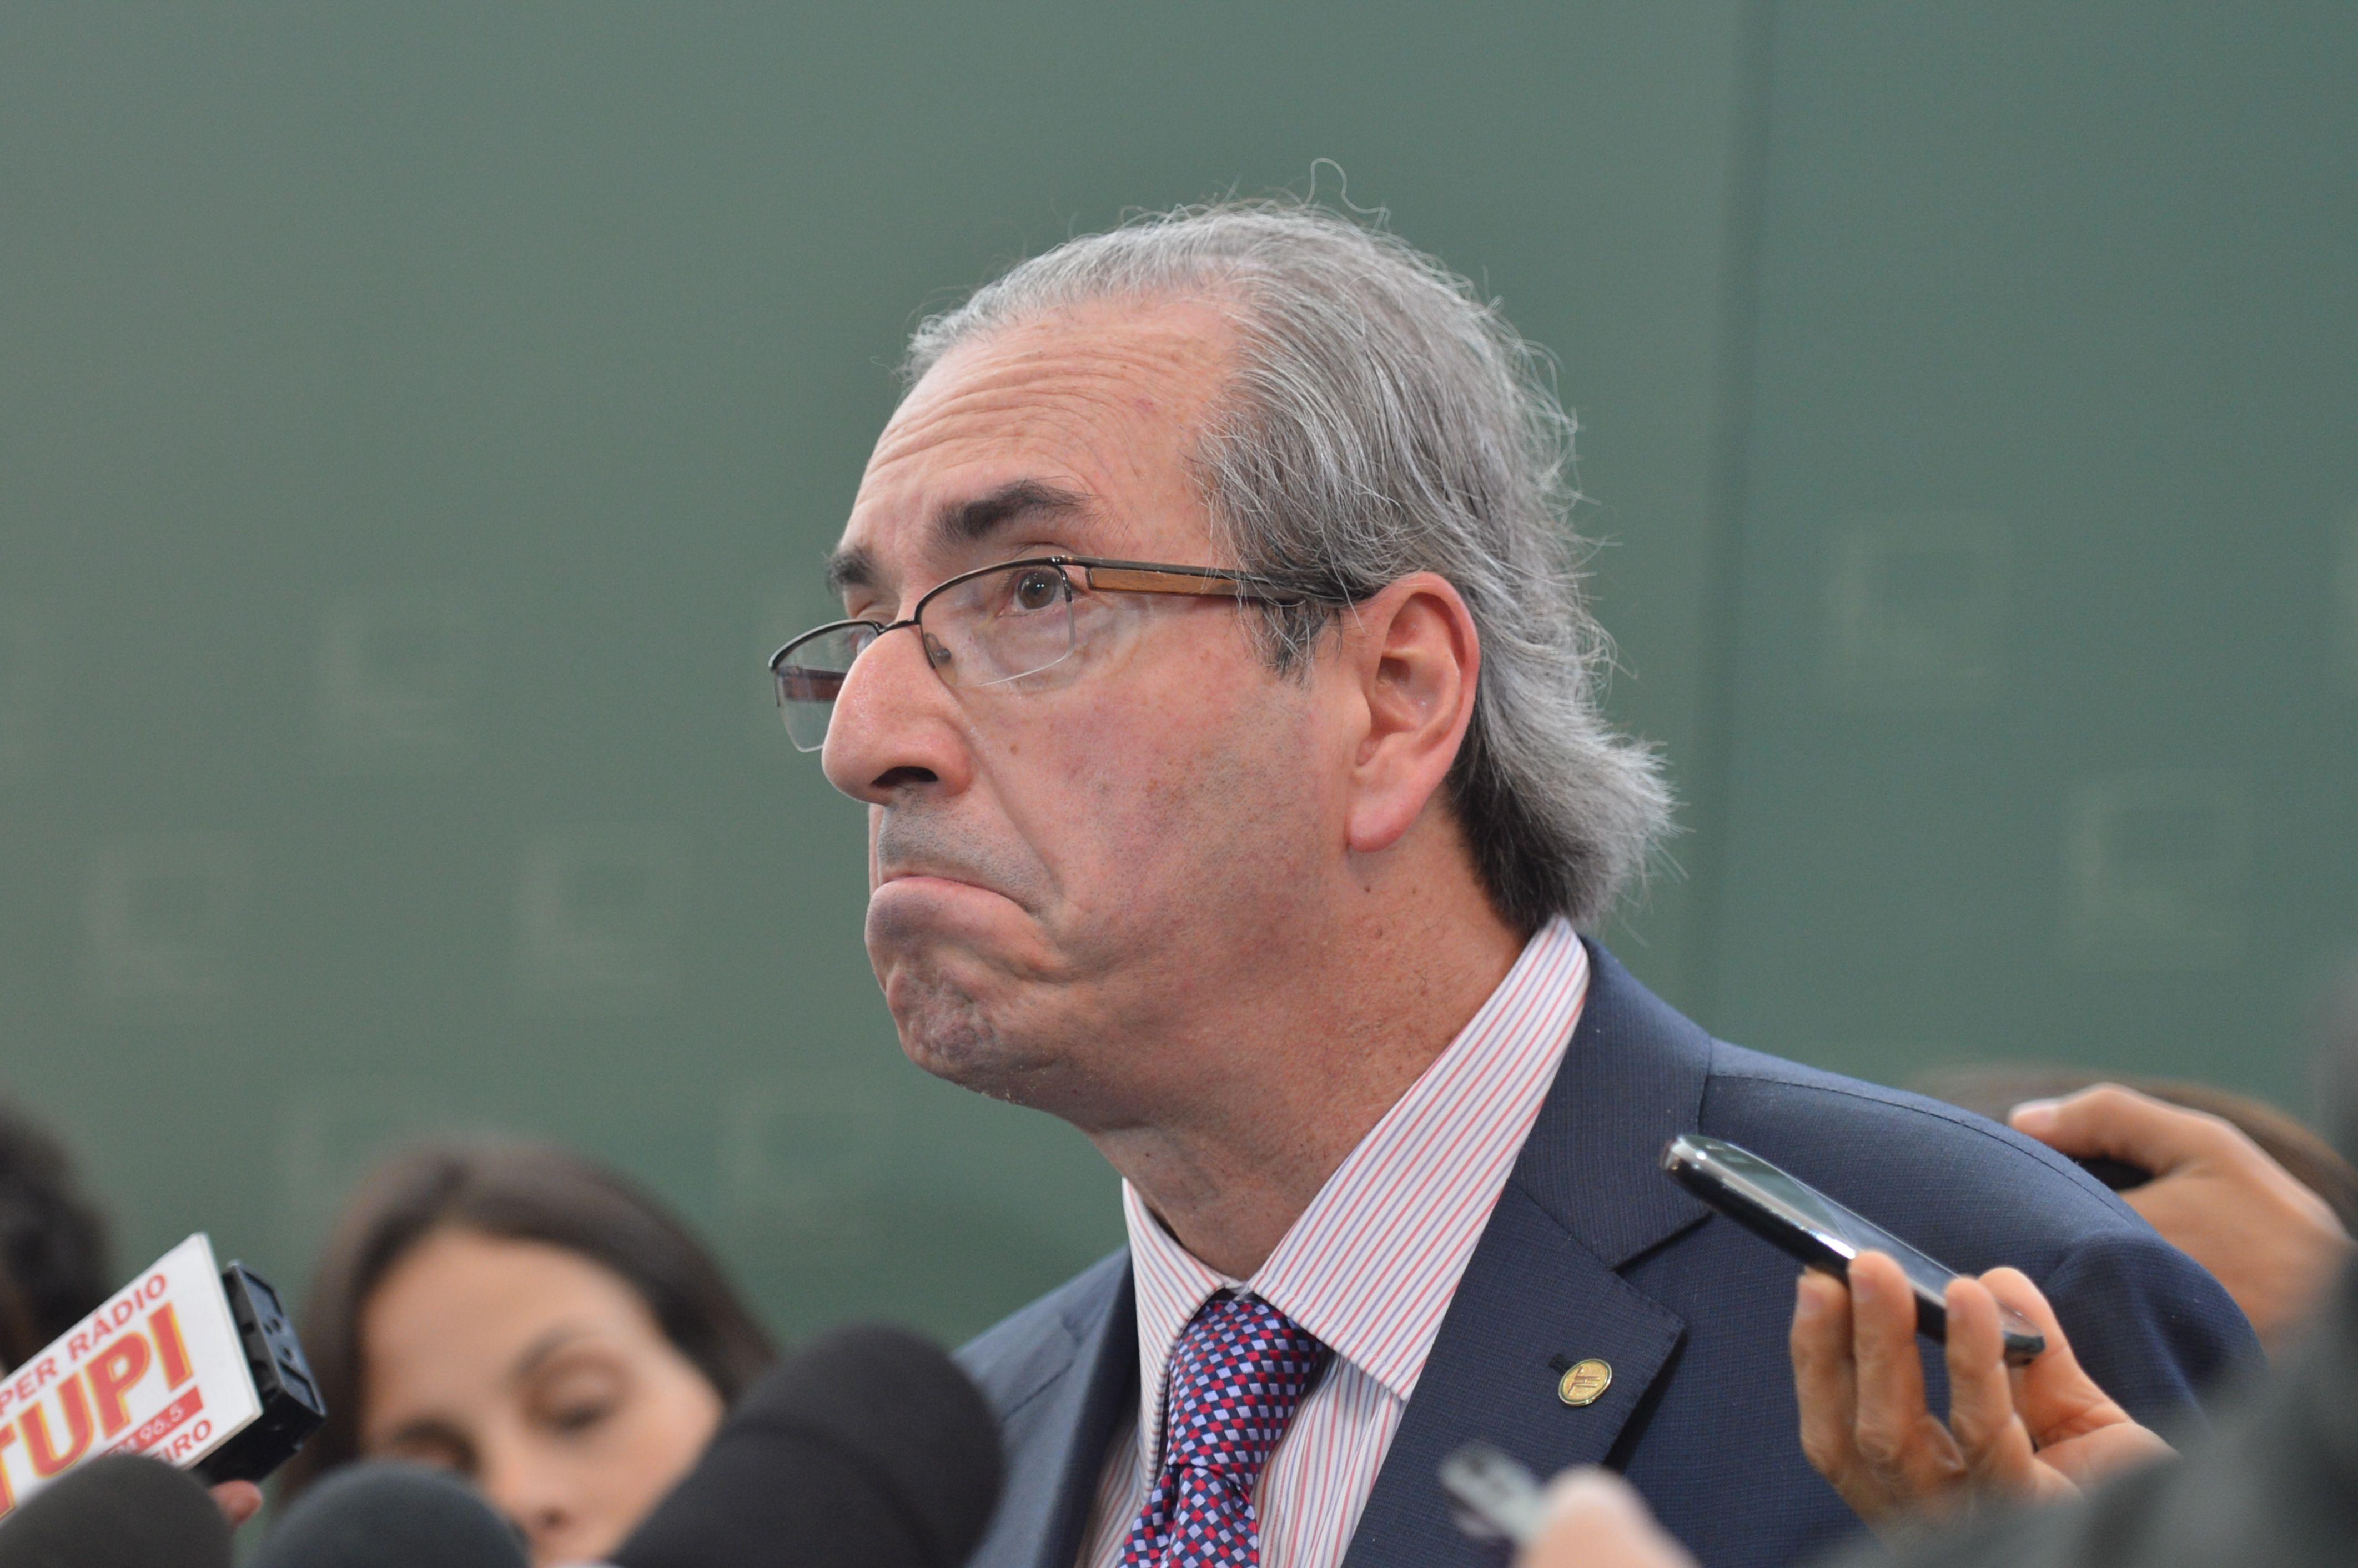 Efeito Cid Gomes